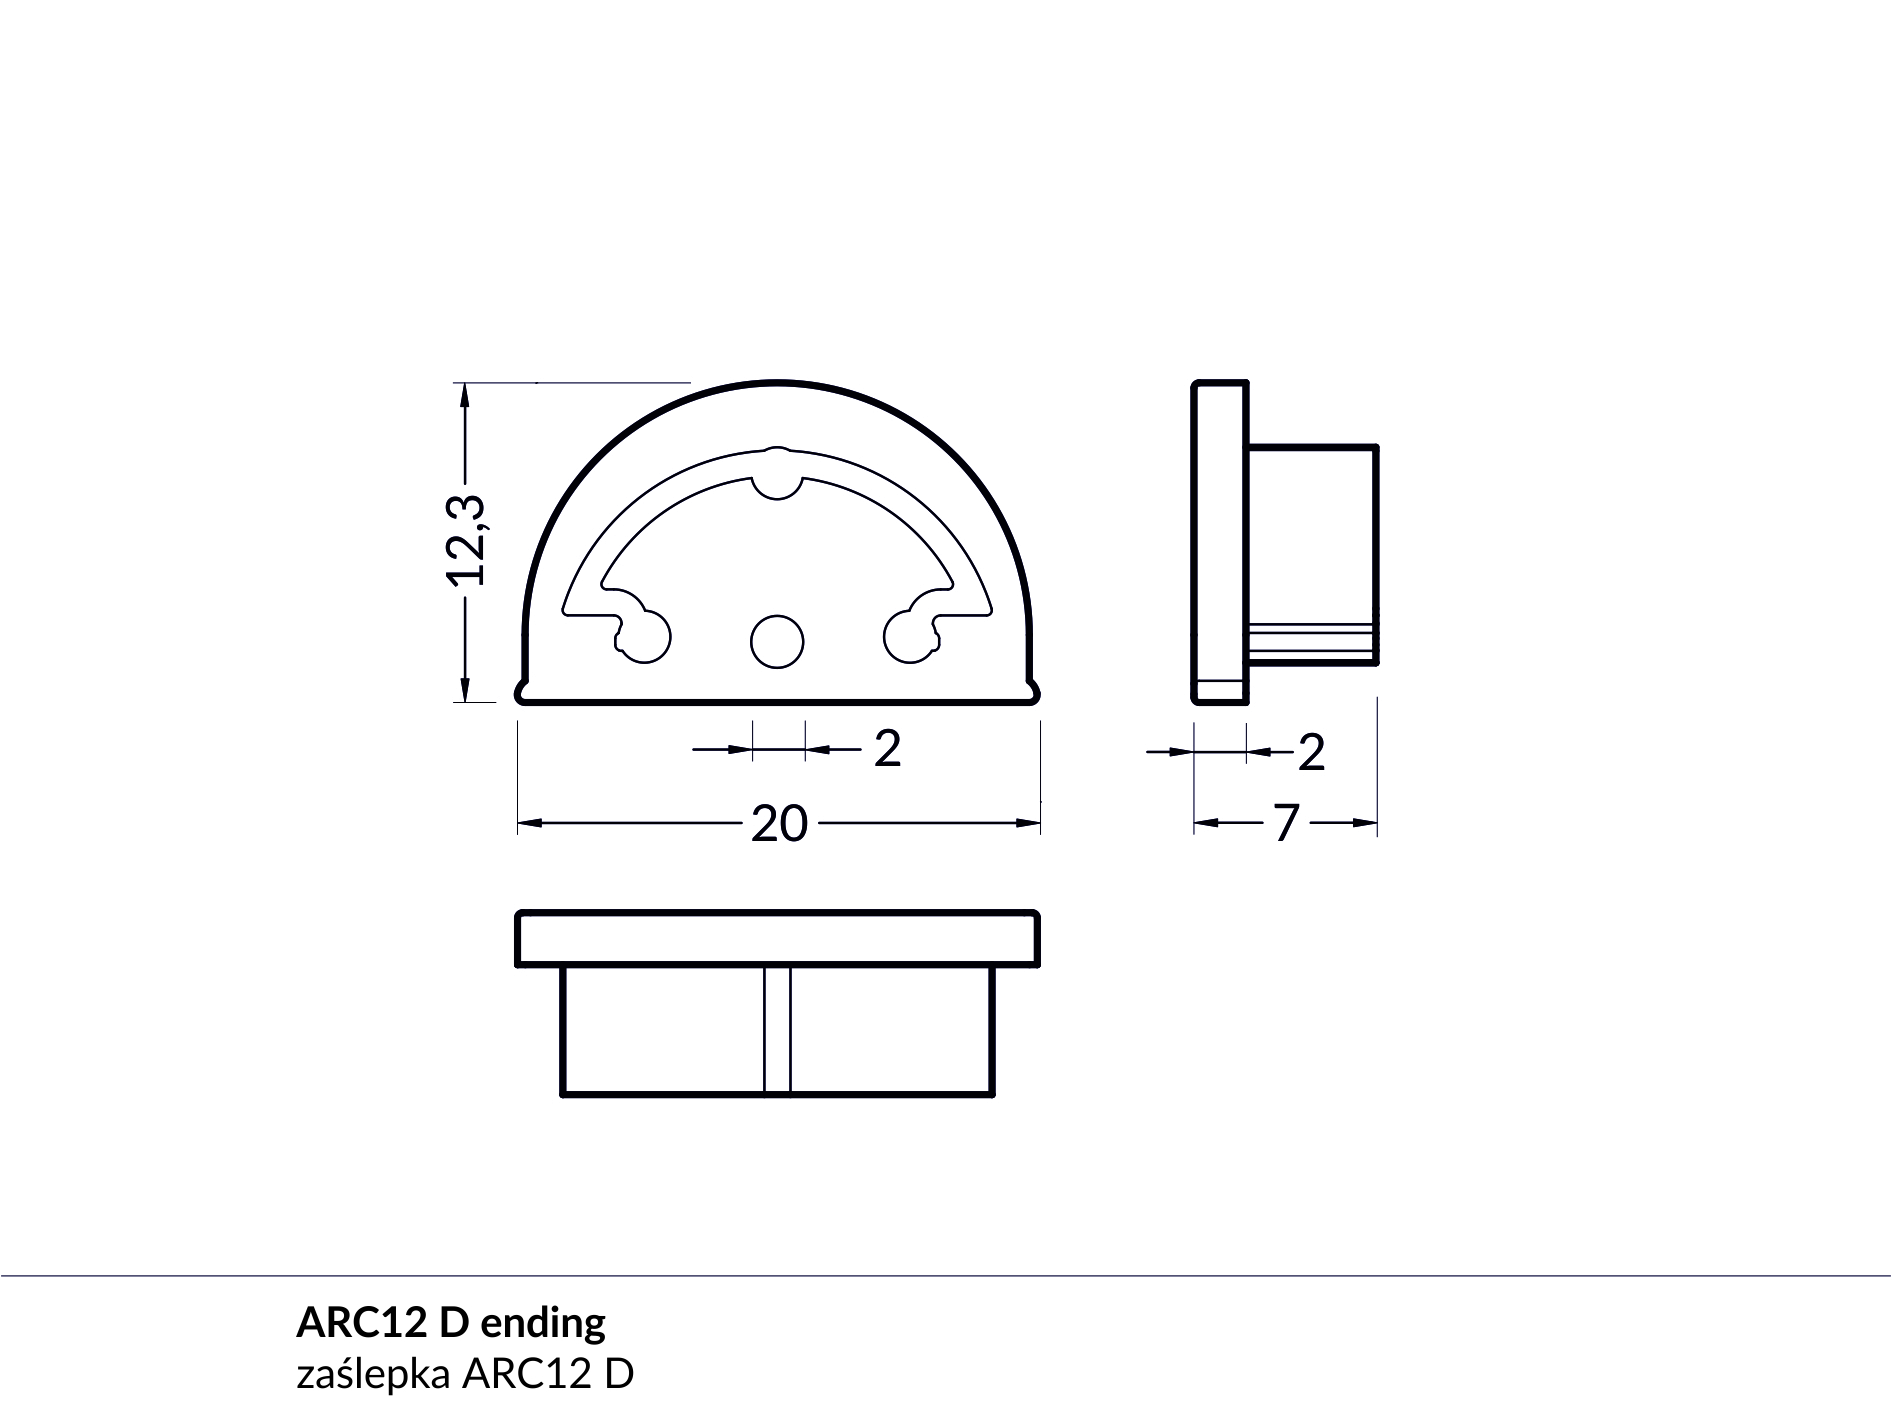 ARC12_D_ending_dimensions.jpg